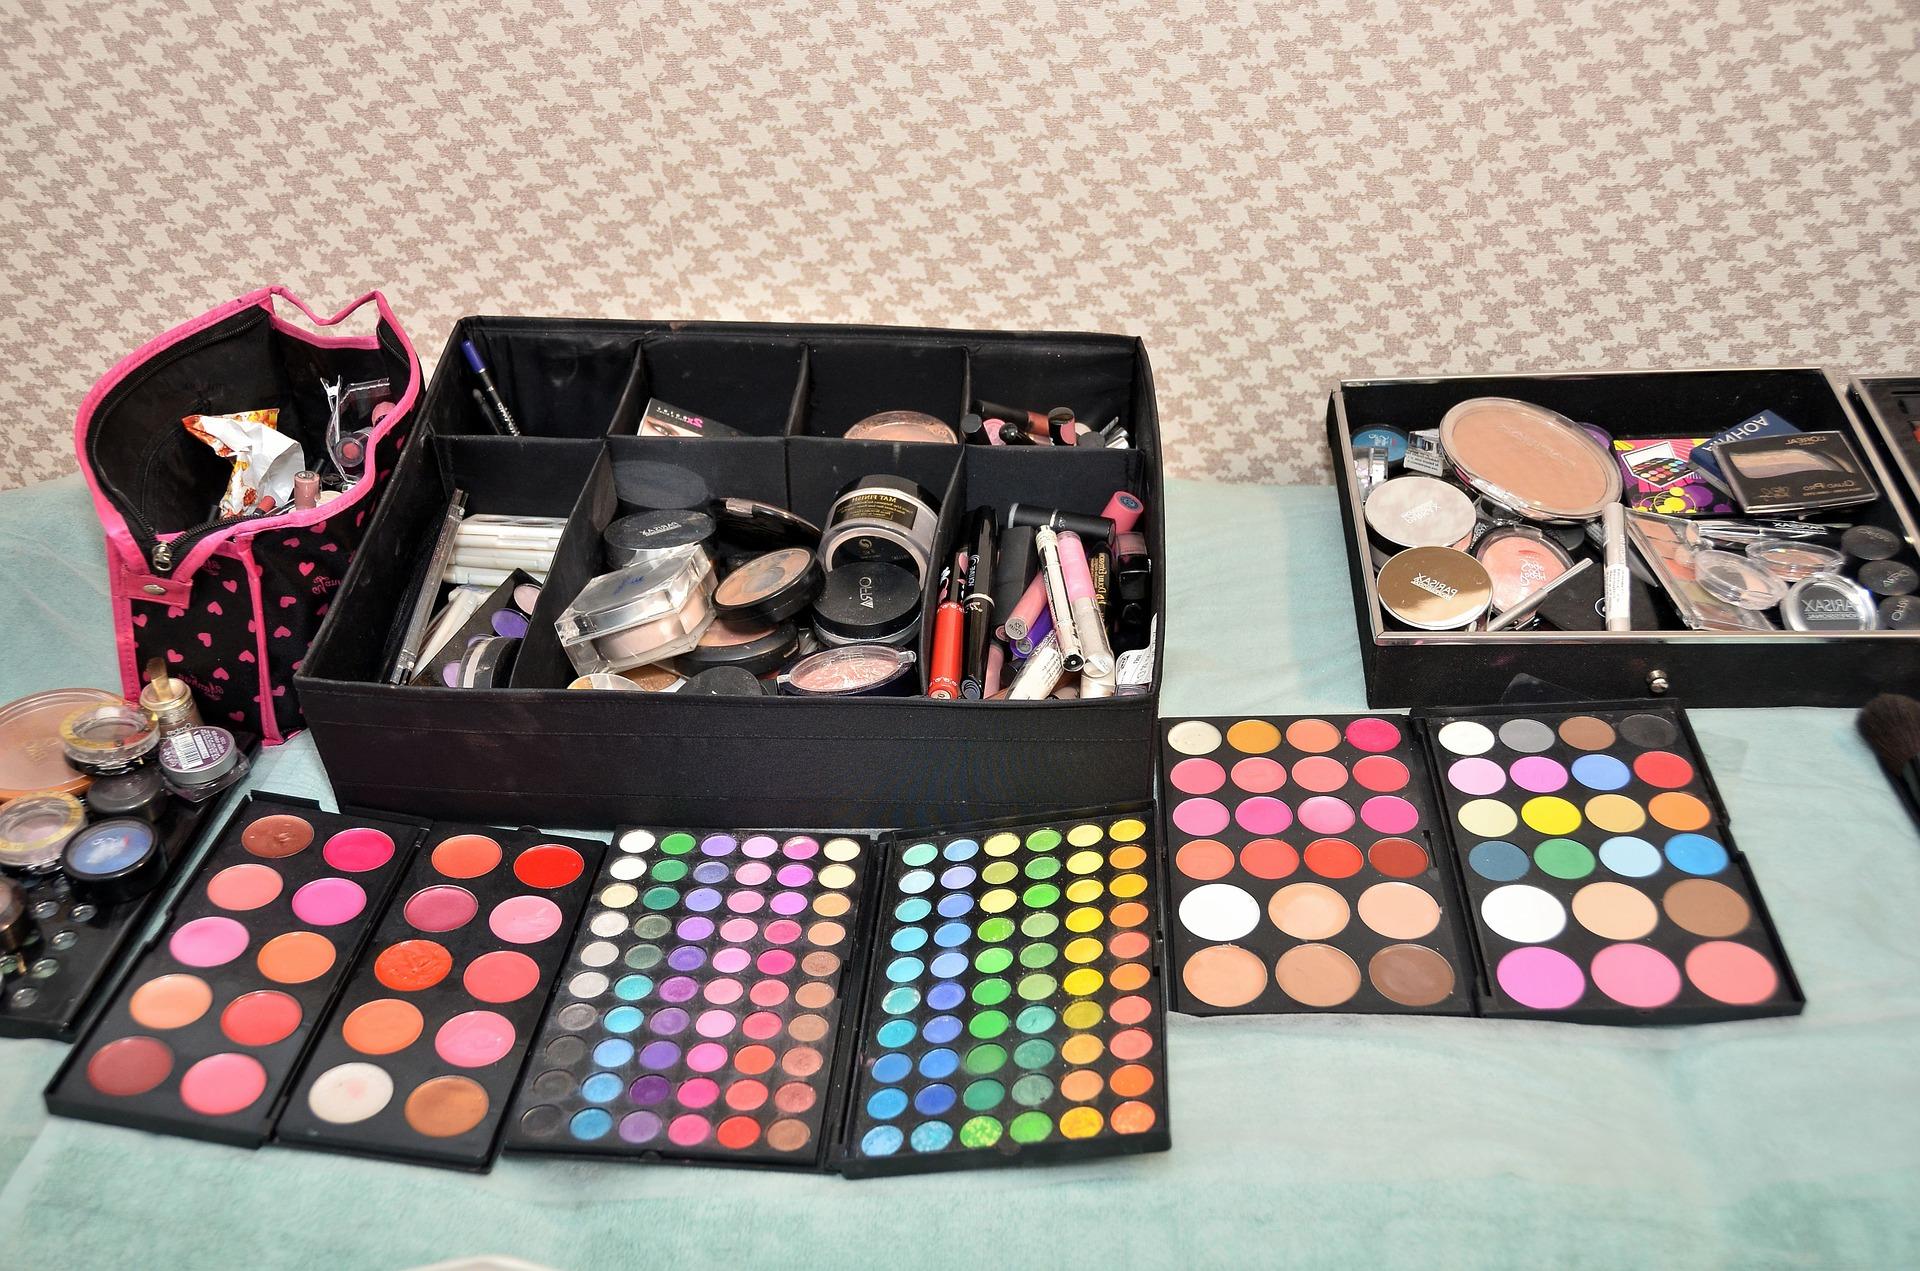 make-up-1376997_1920.jpg